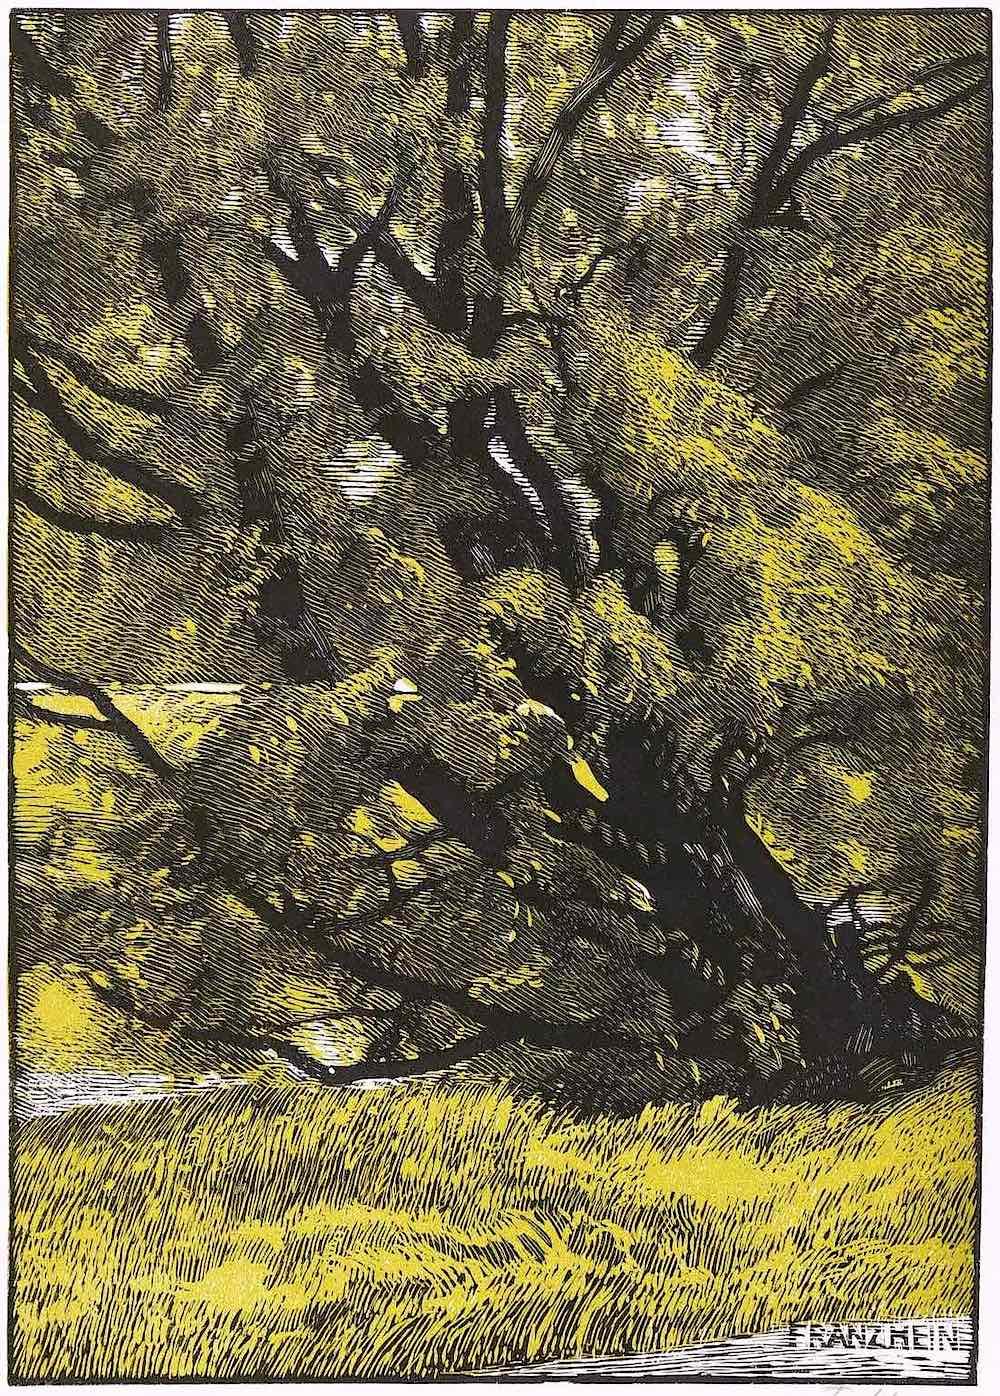 Franz Hein art, a tree